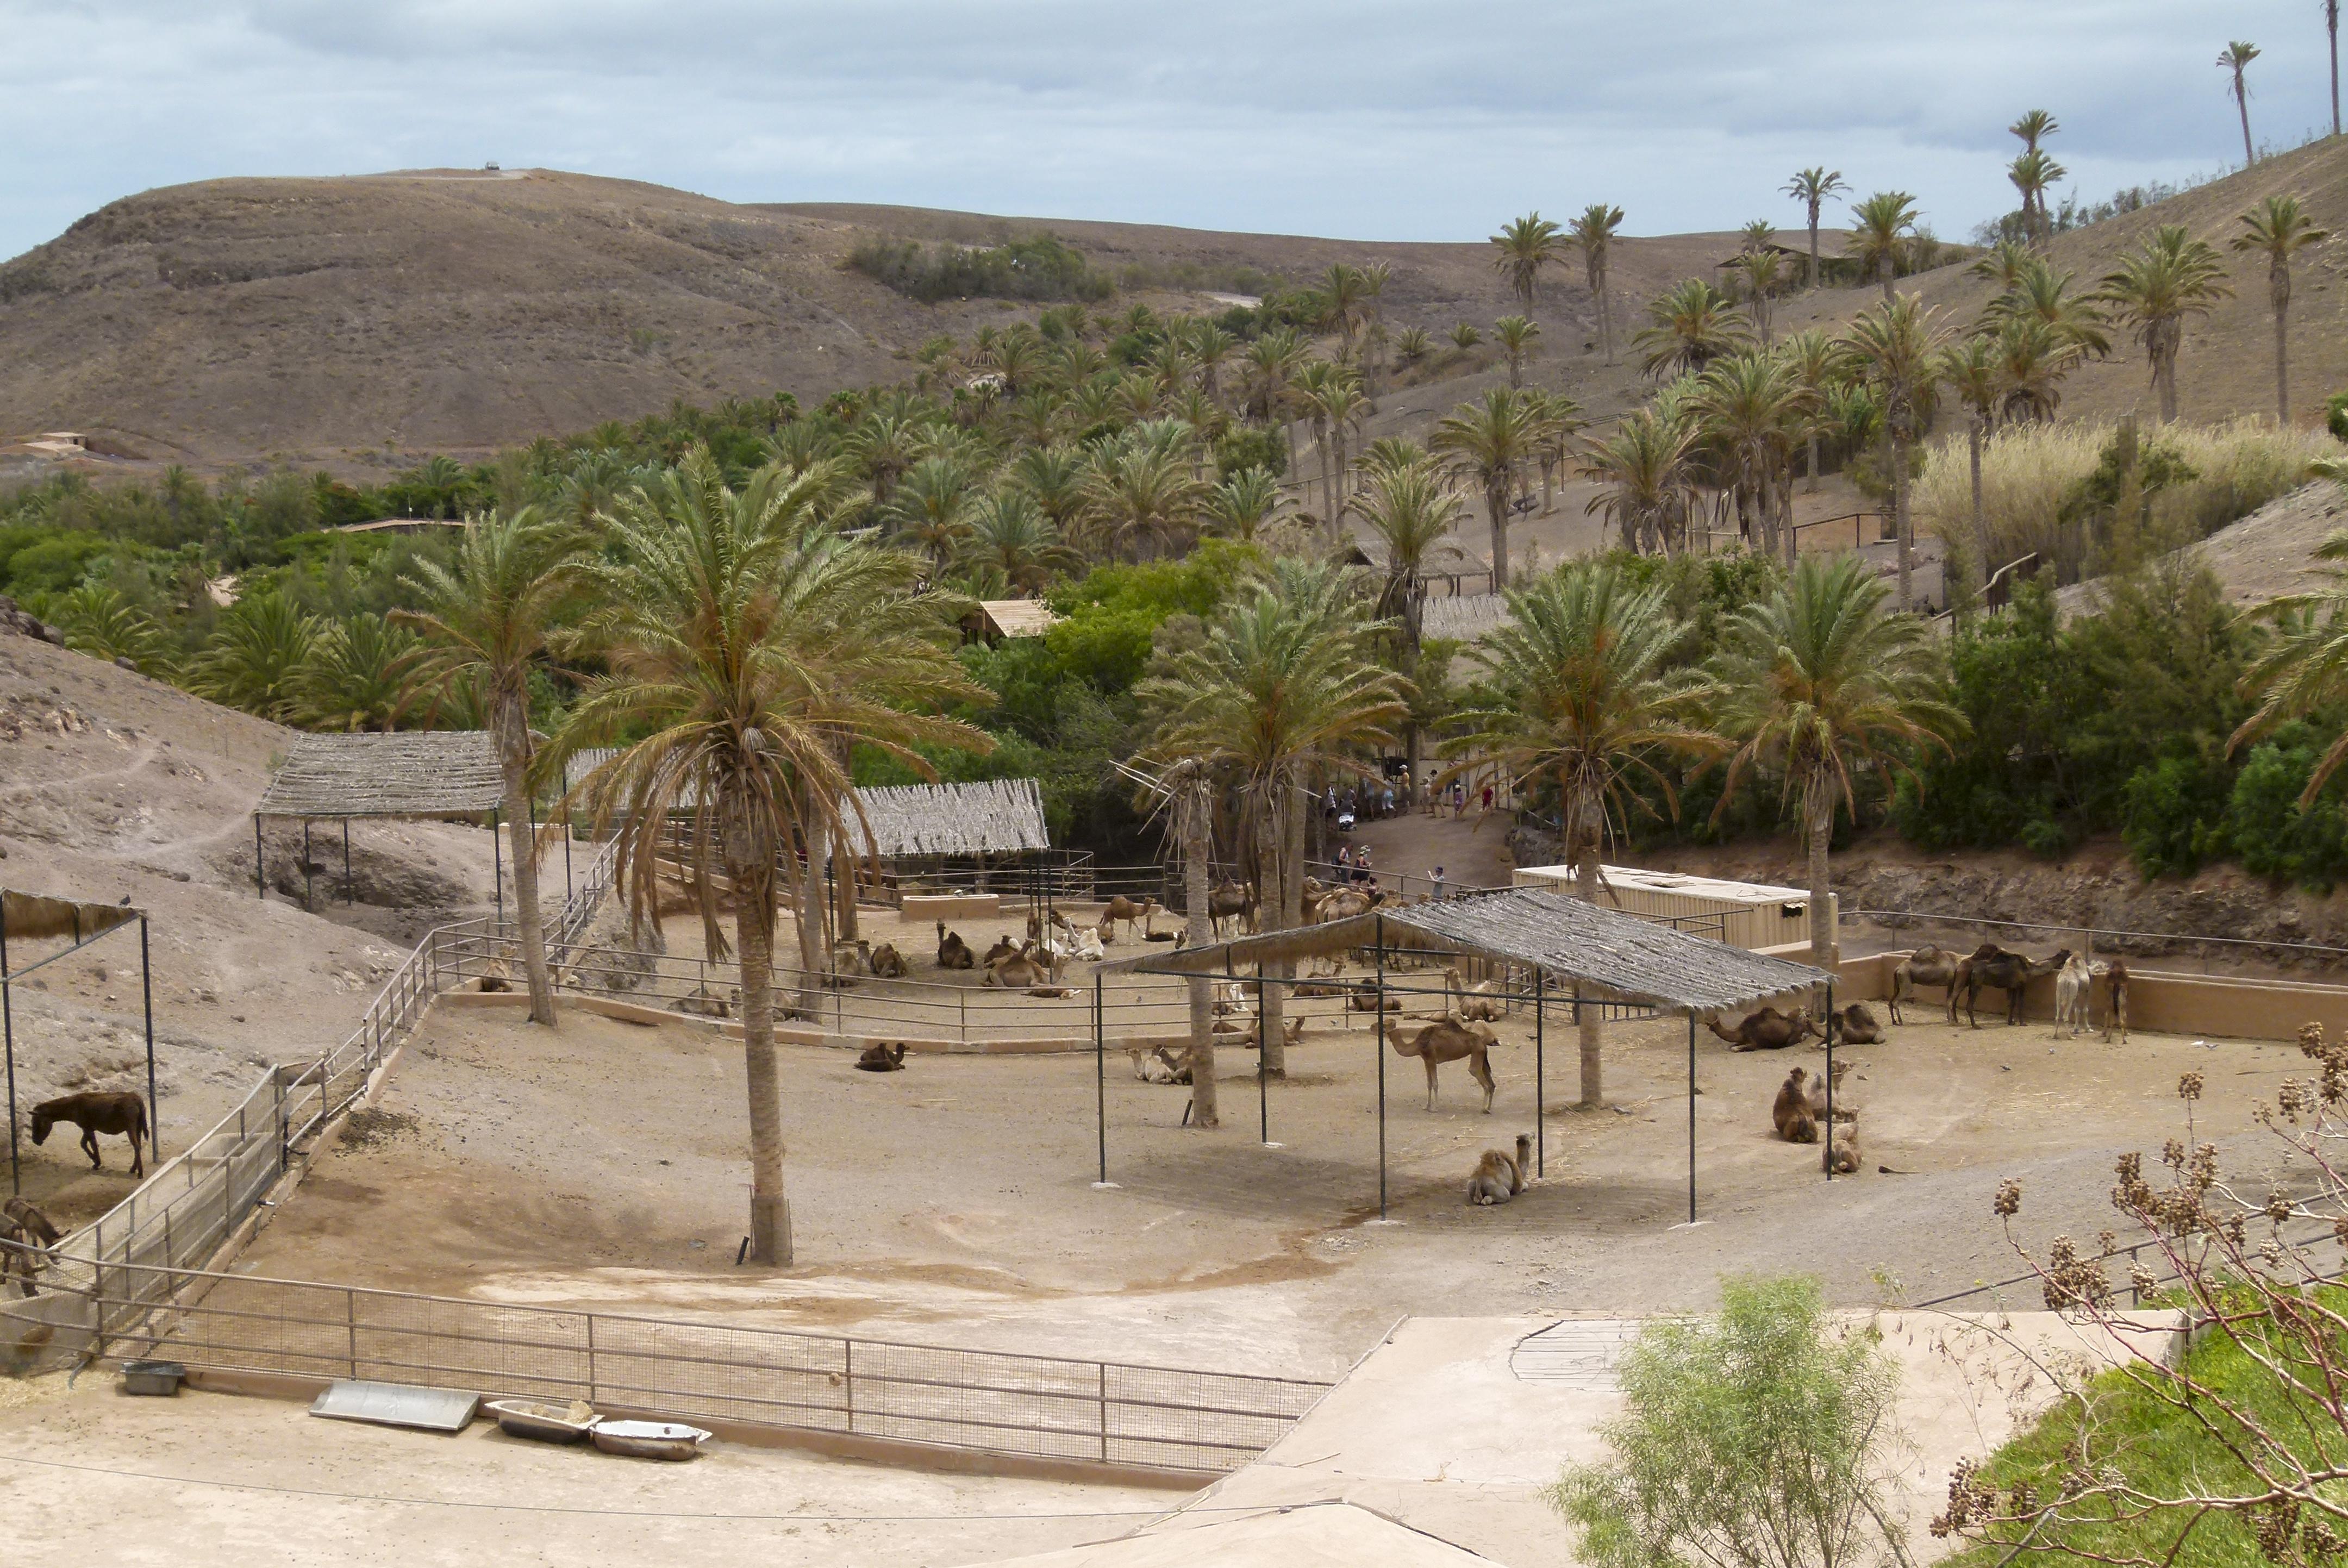 File:Dromedary compound - Oasis Park - Fuerteventura.jpg